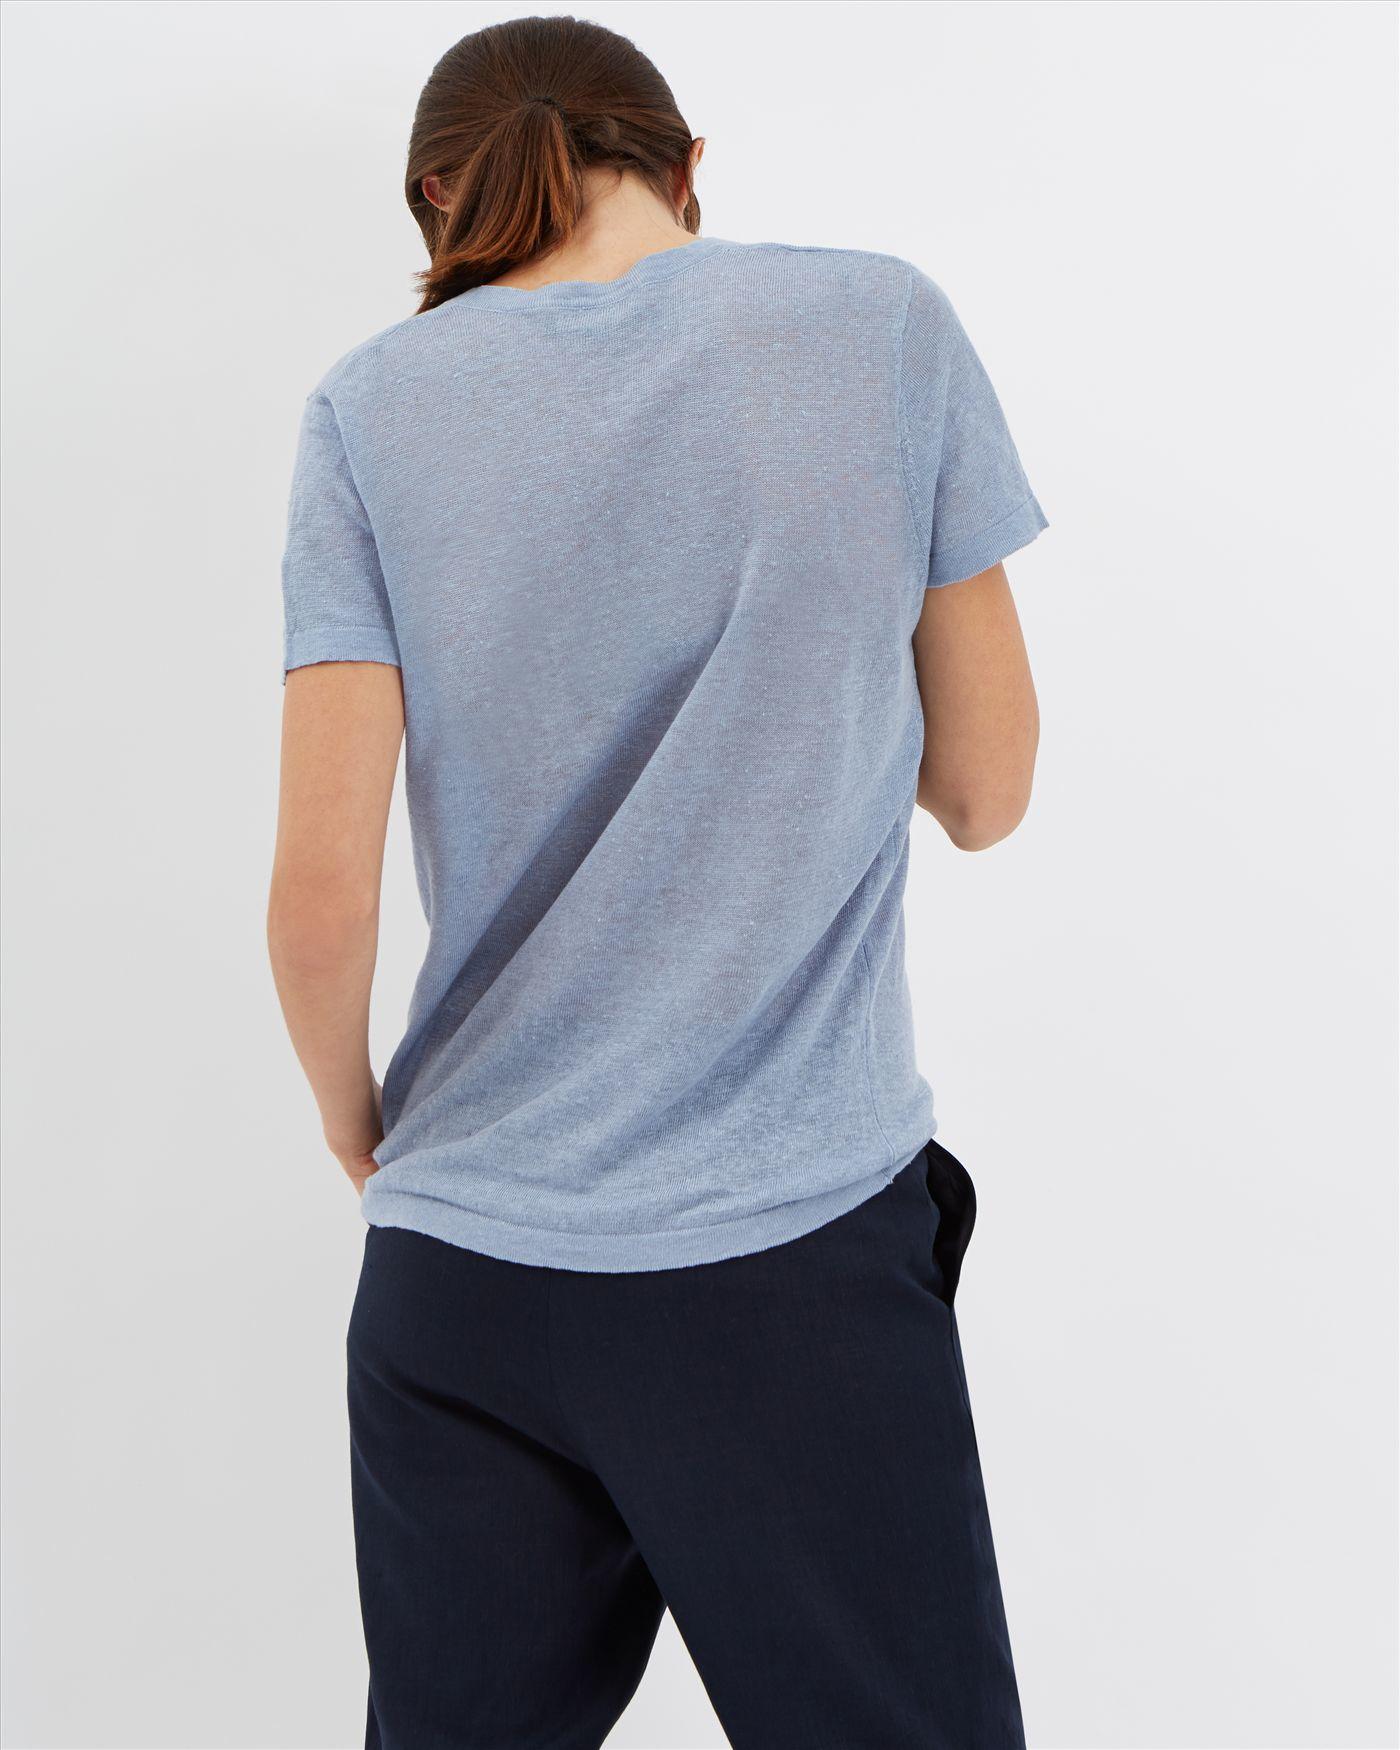 Lyst jaeger linen short sleeved t shirt in blue for Short sleeve linen shirt